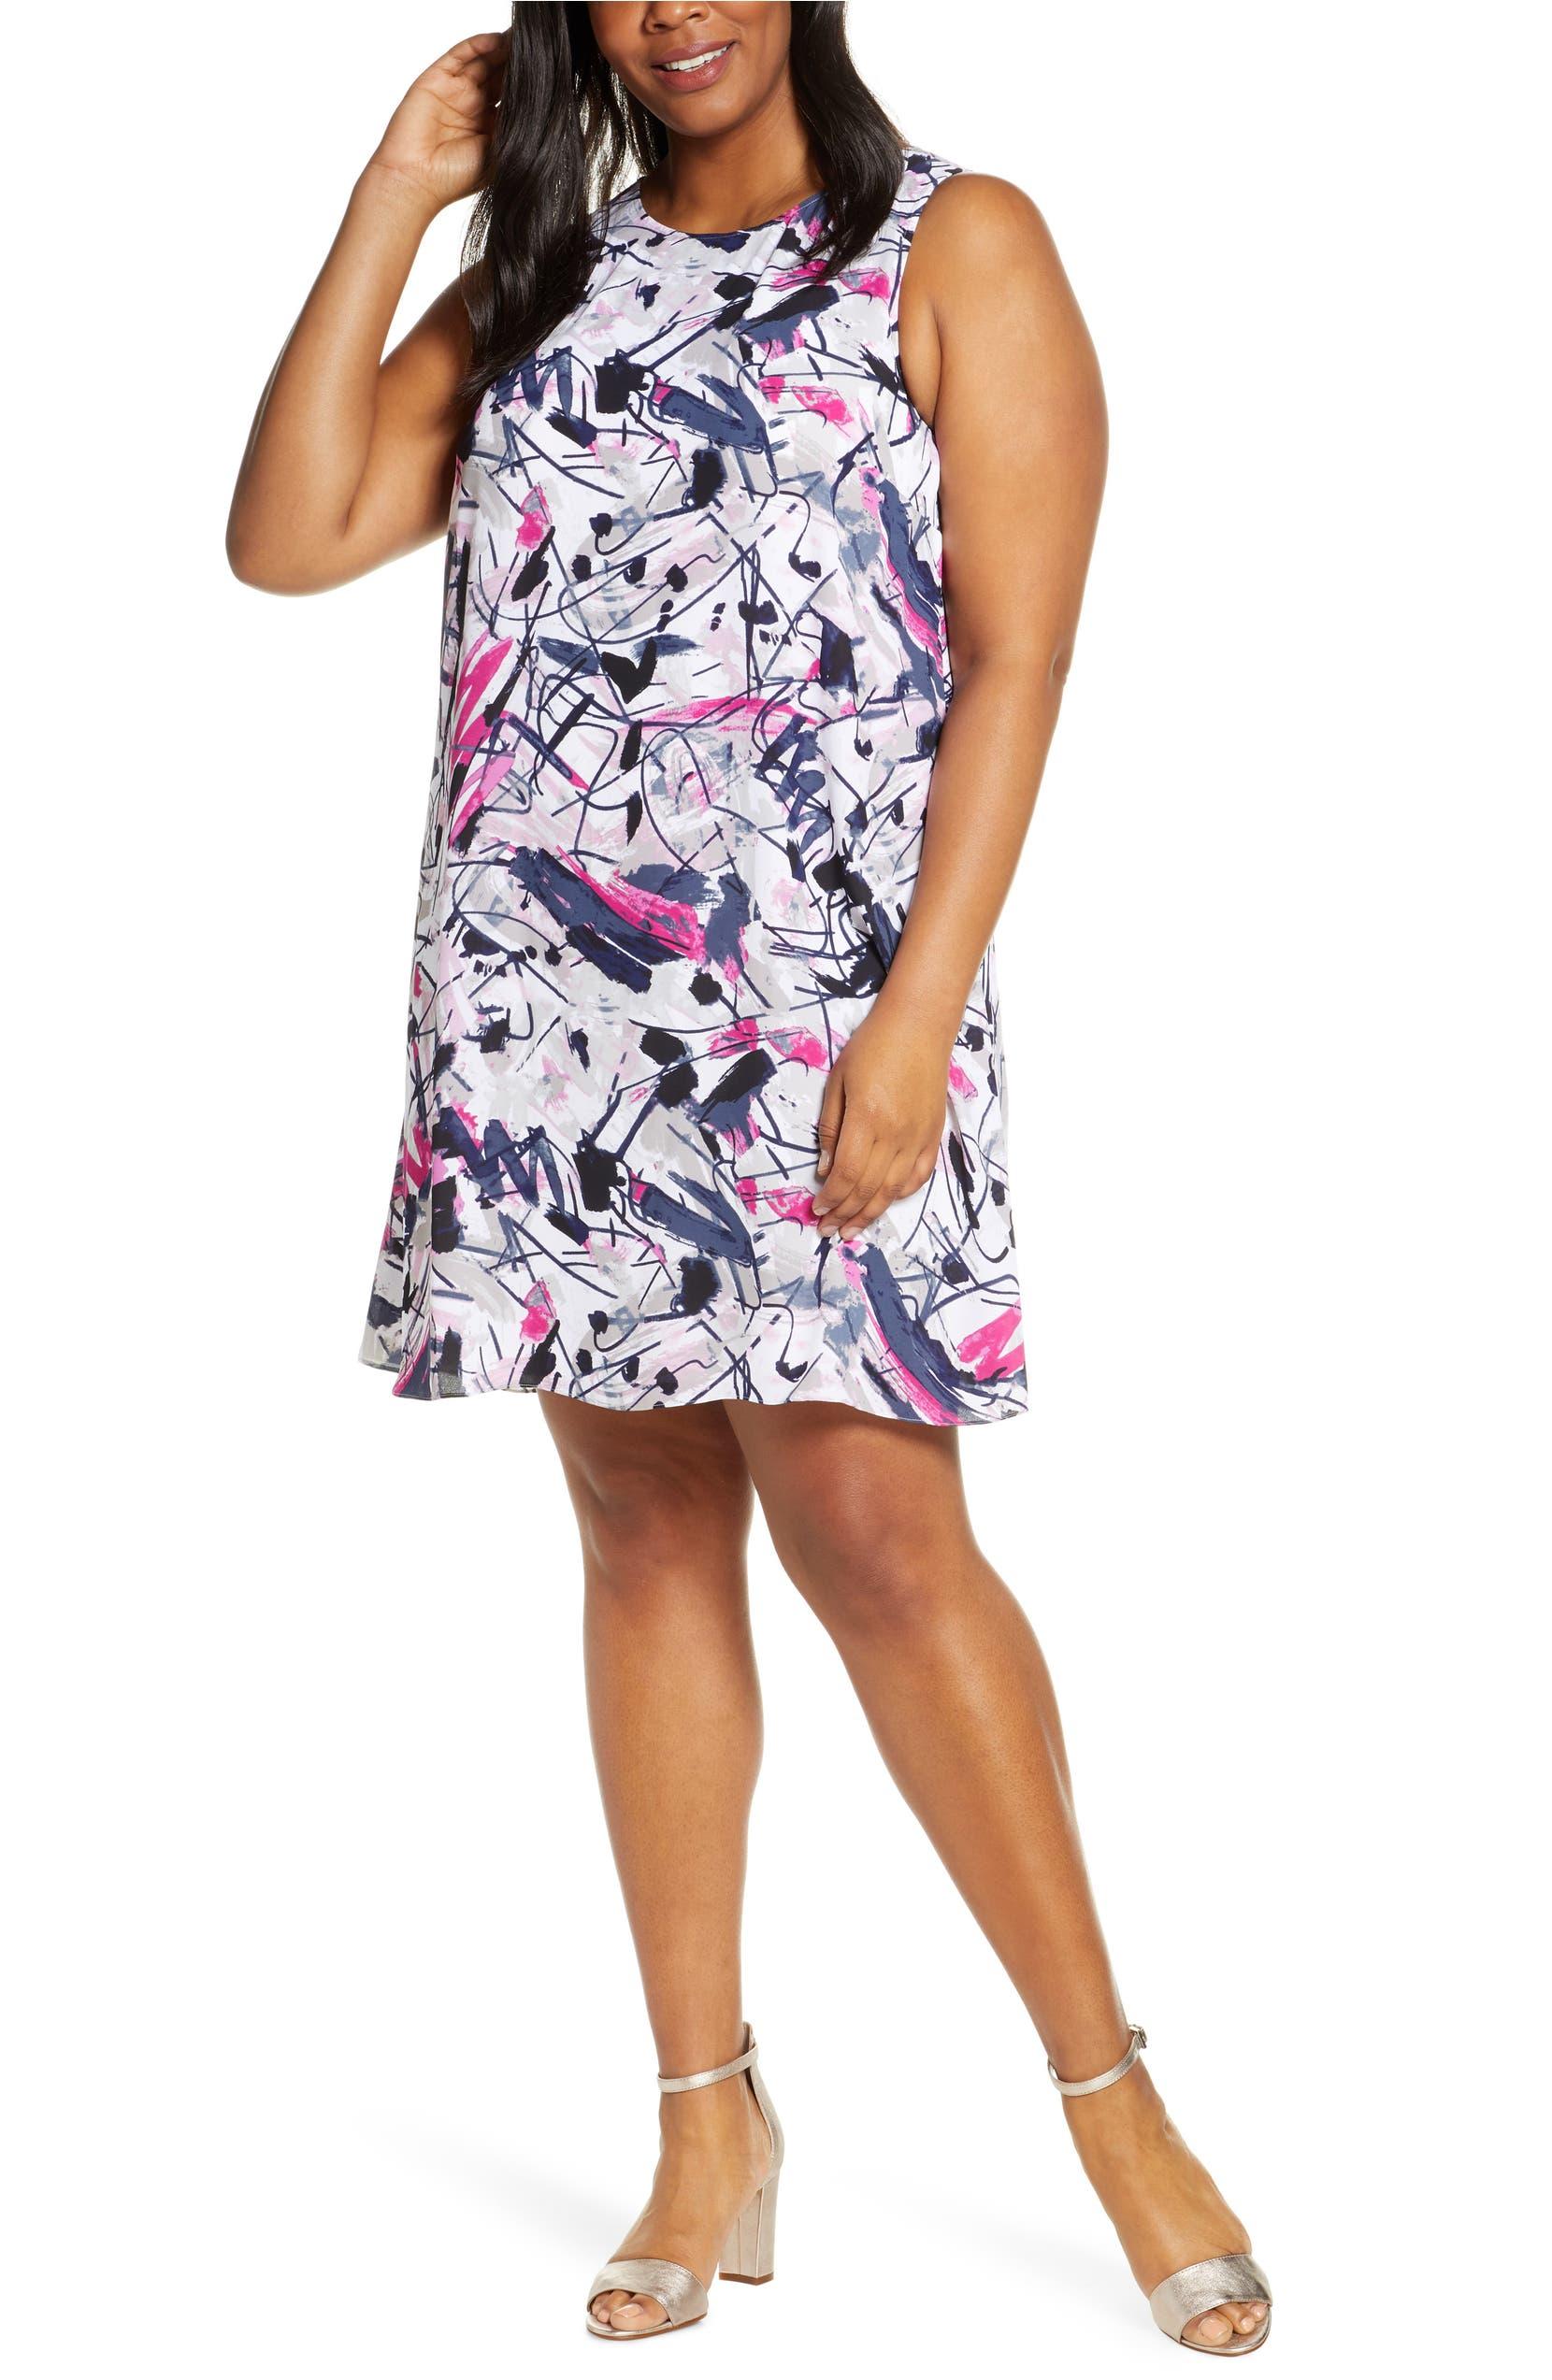 Graffiti Femme Shift Dress